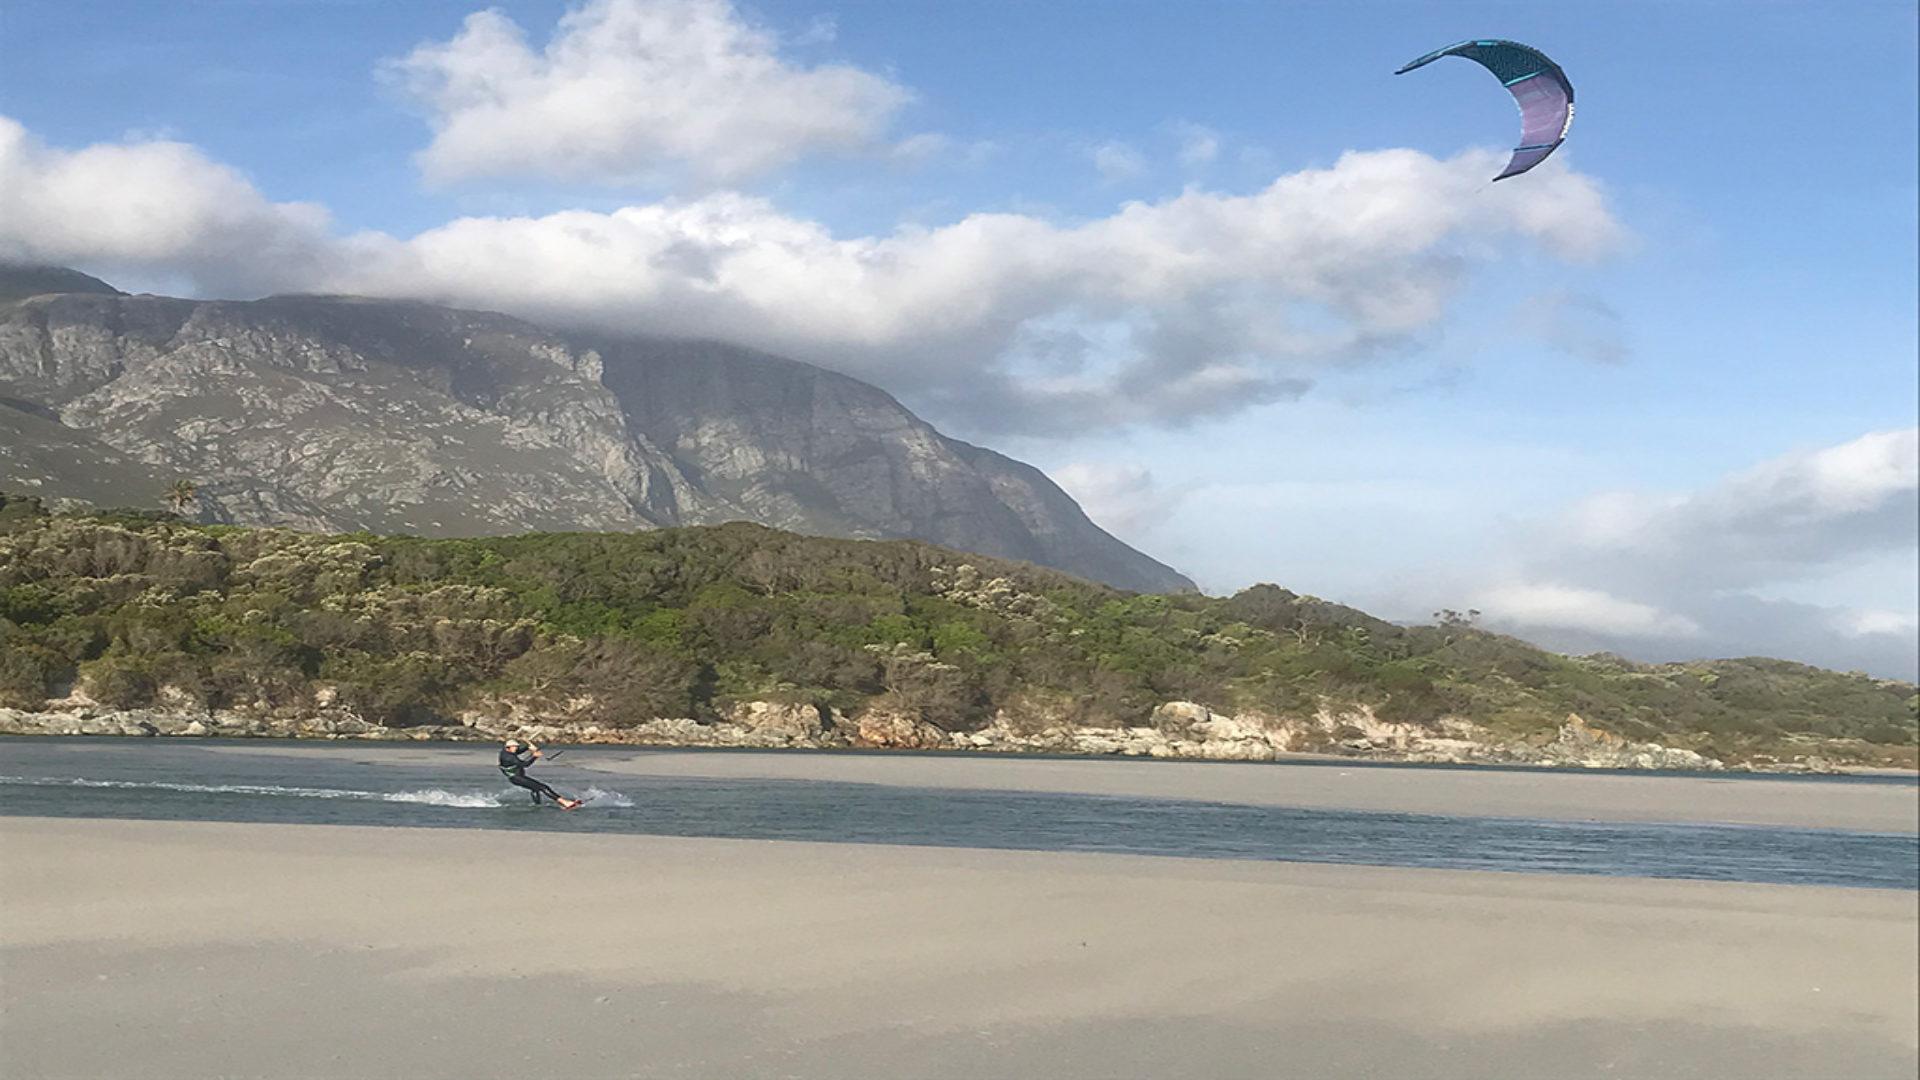 kite-surf-hermanus-kitesurfer-mountain-01